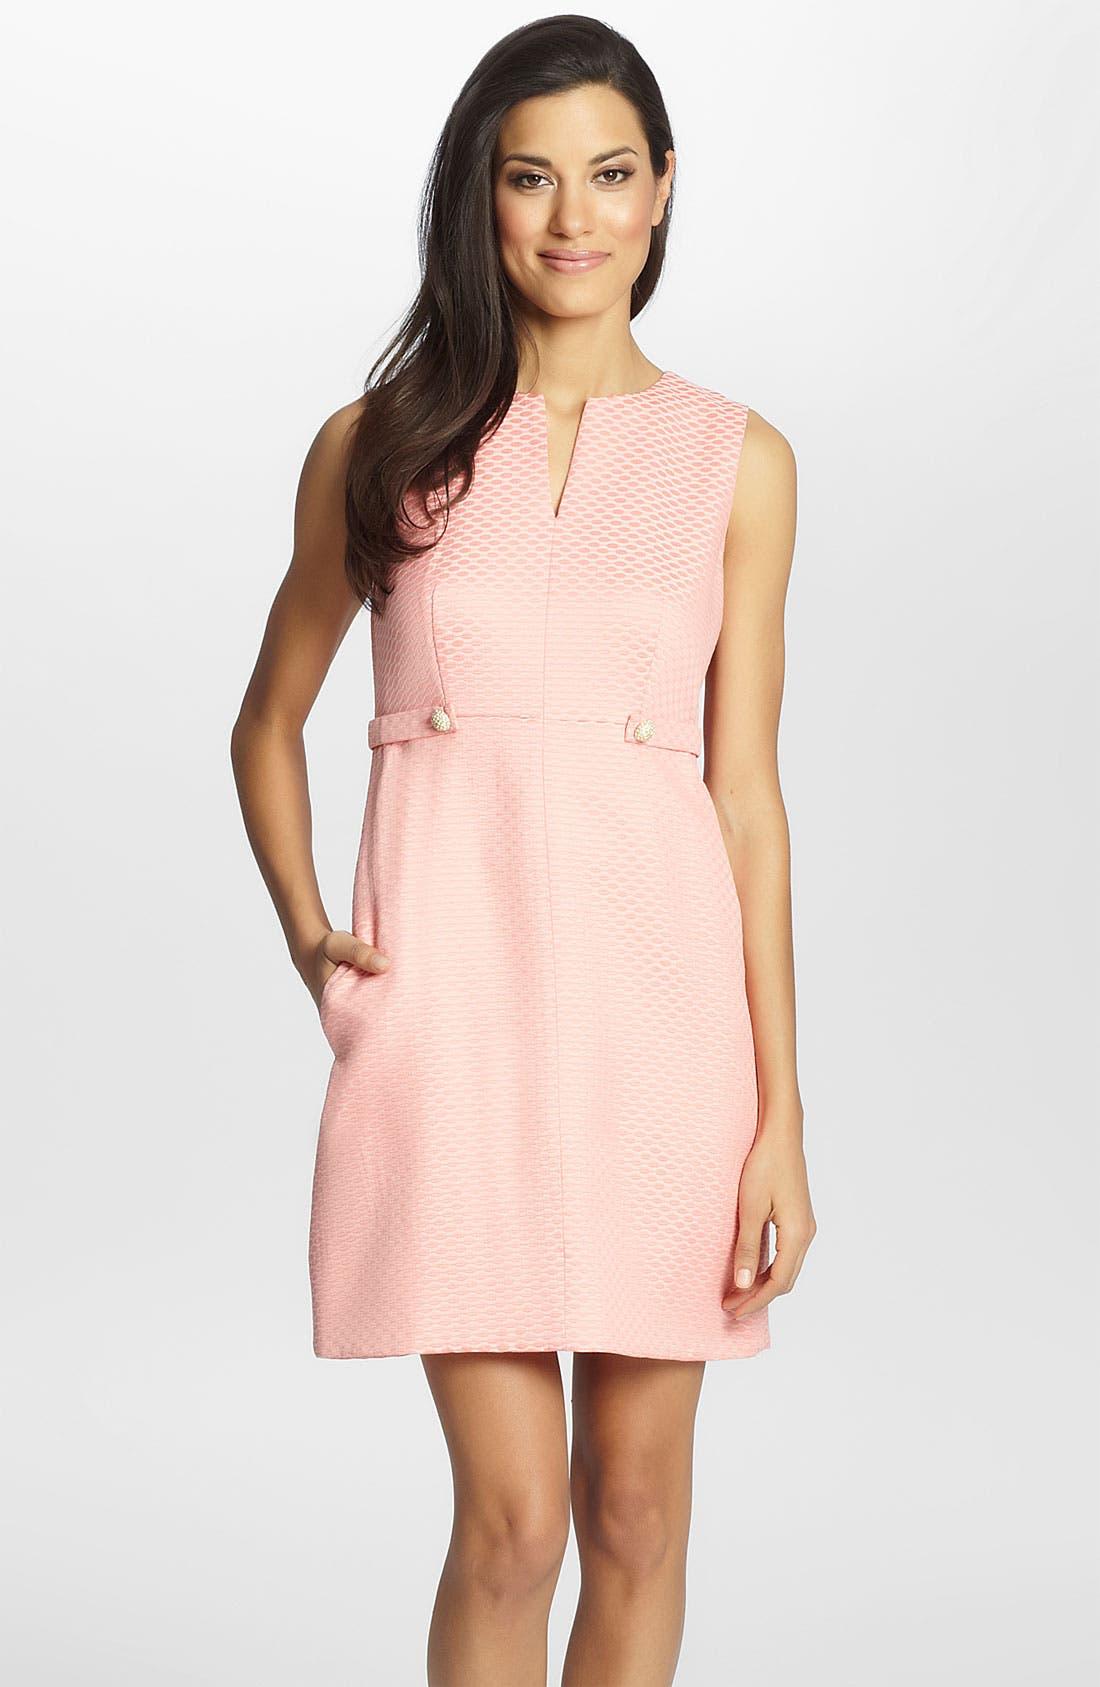 Alternate Image 1 Selected - Cynthia Steffe 'Addison' Jacquard Sheath Dress